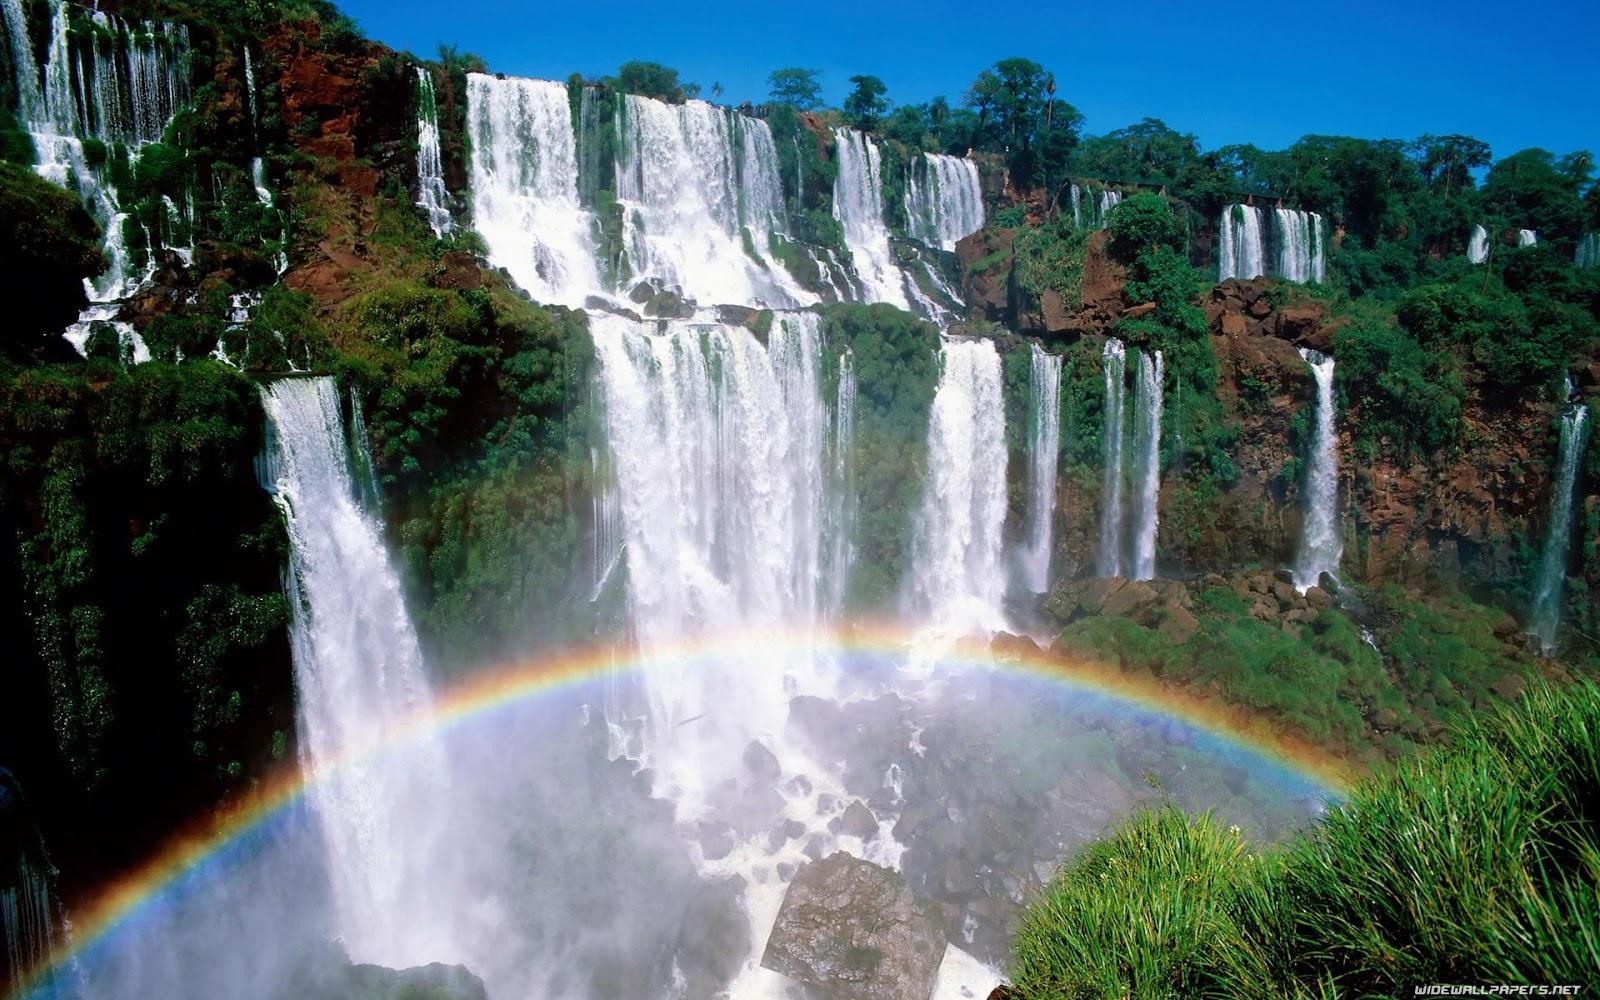 Top Wallpaper High Quality Waterfall - Rainbow_waterfall  Graphic_94153.jpg